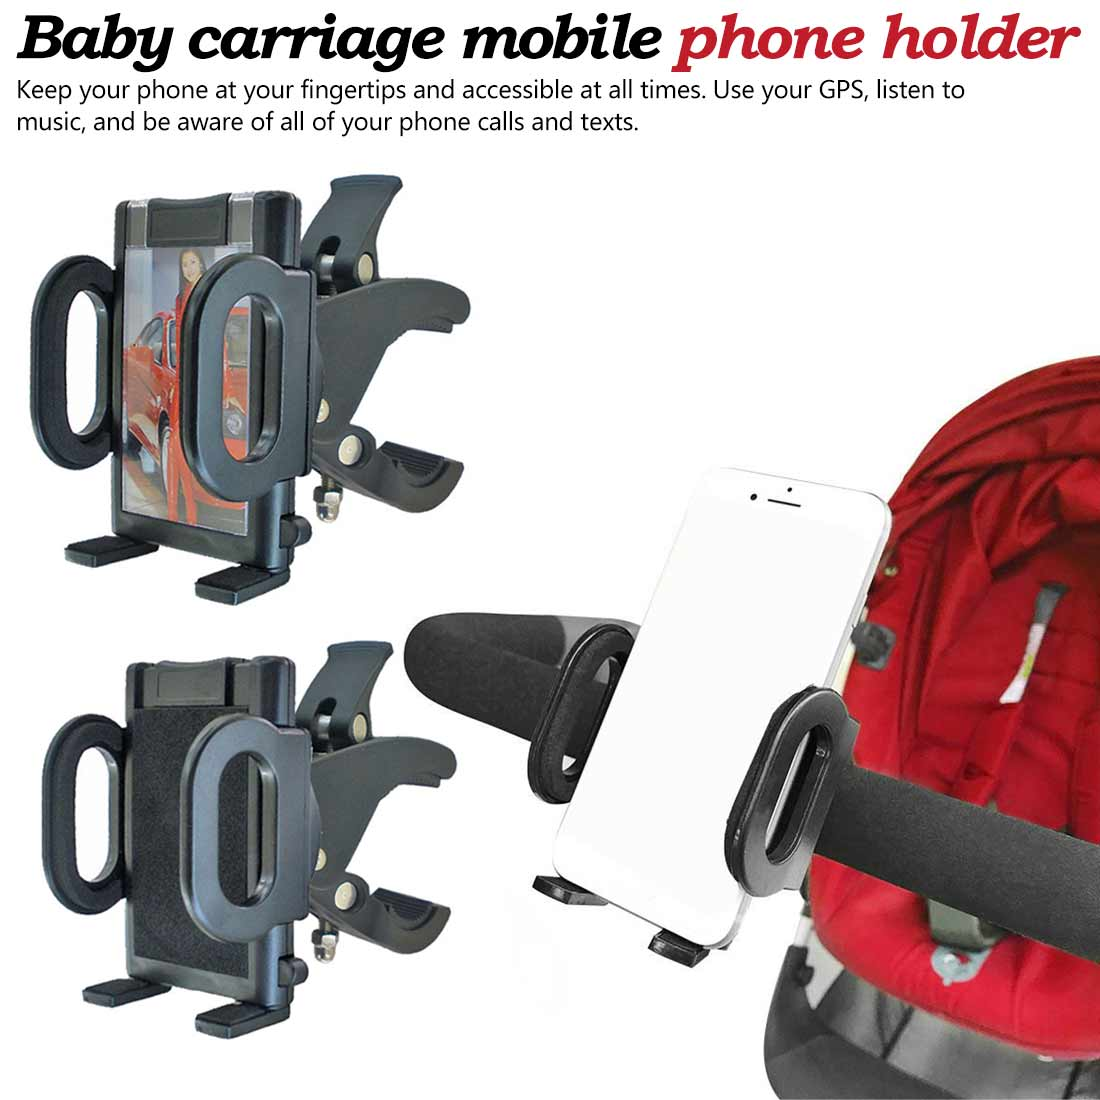 1pc Baby Stroller Mobile Phone Stander Children Cart Accessories Baby Carriage Outdoor Bracket Cellphone Mount Holder